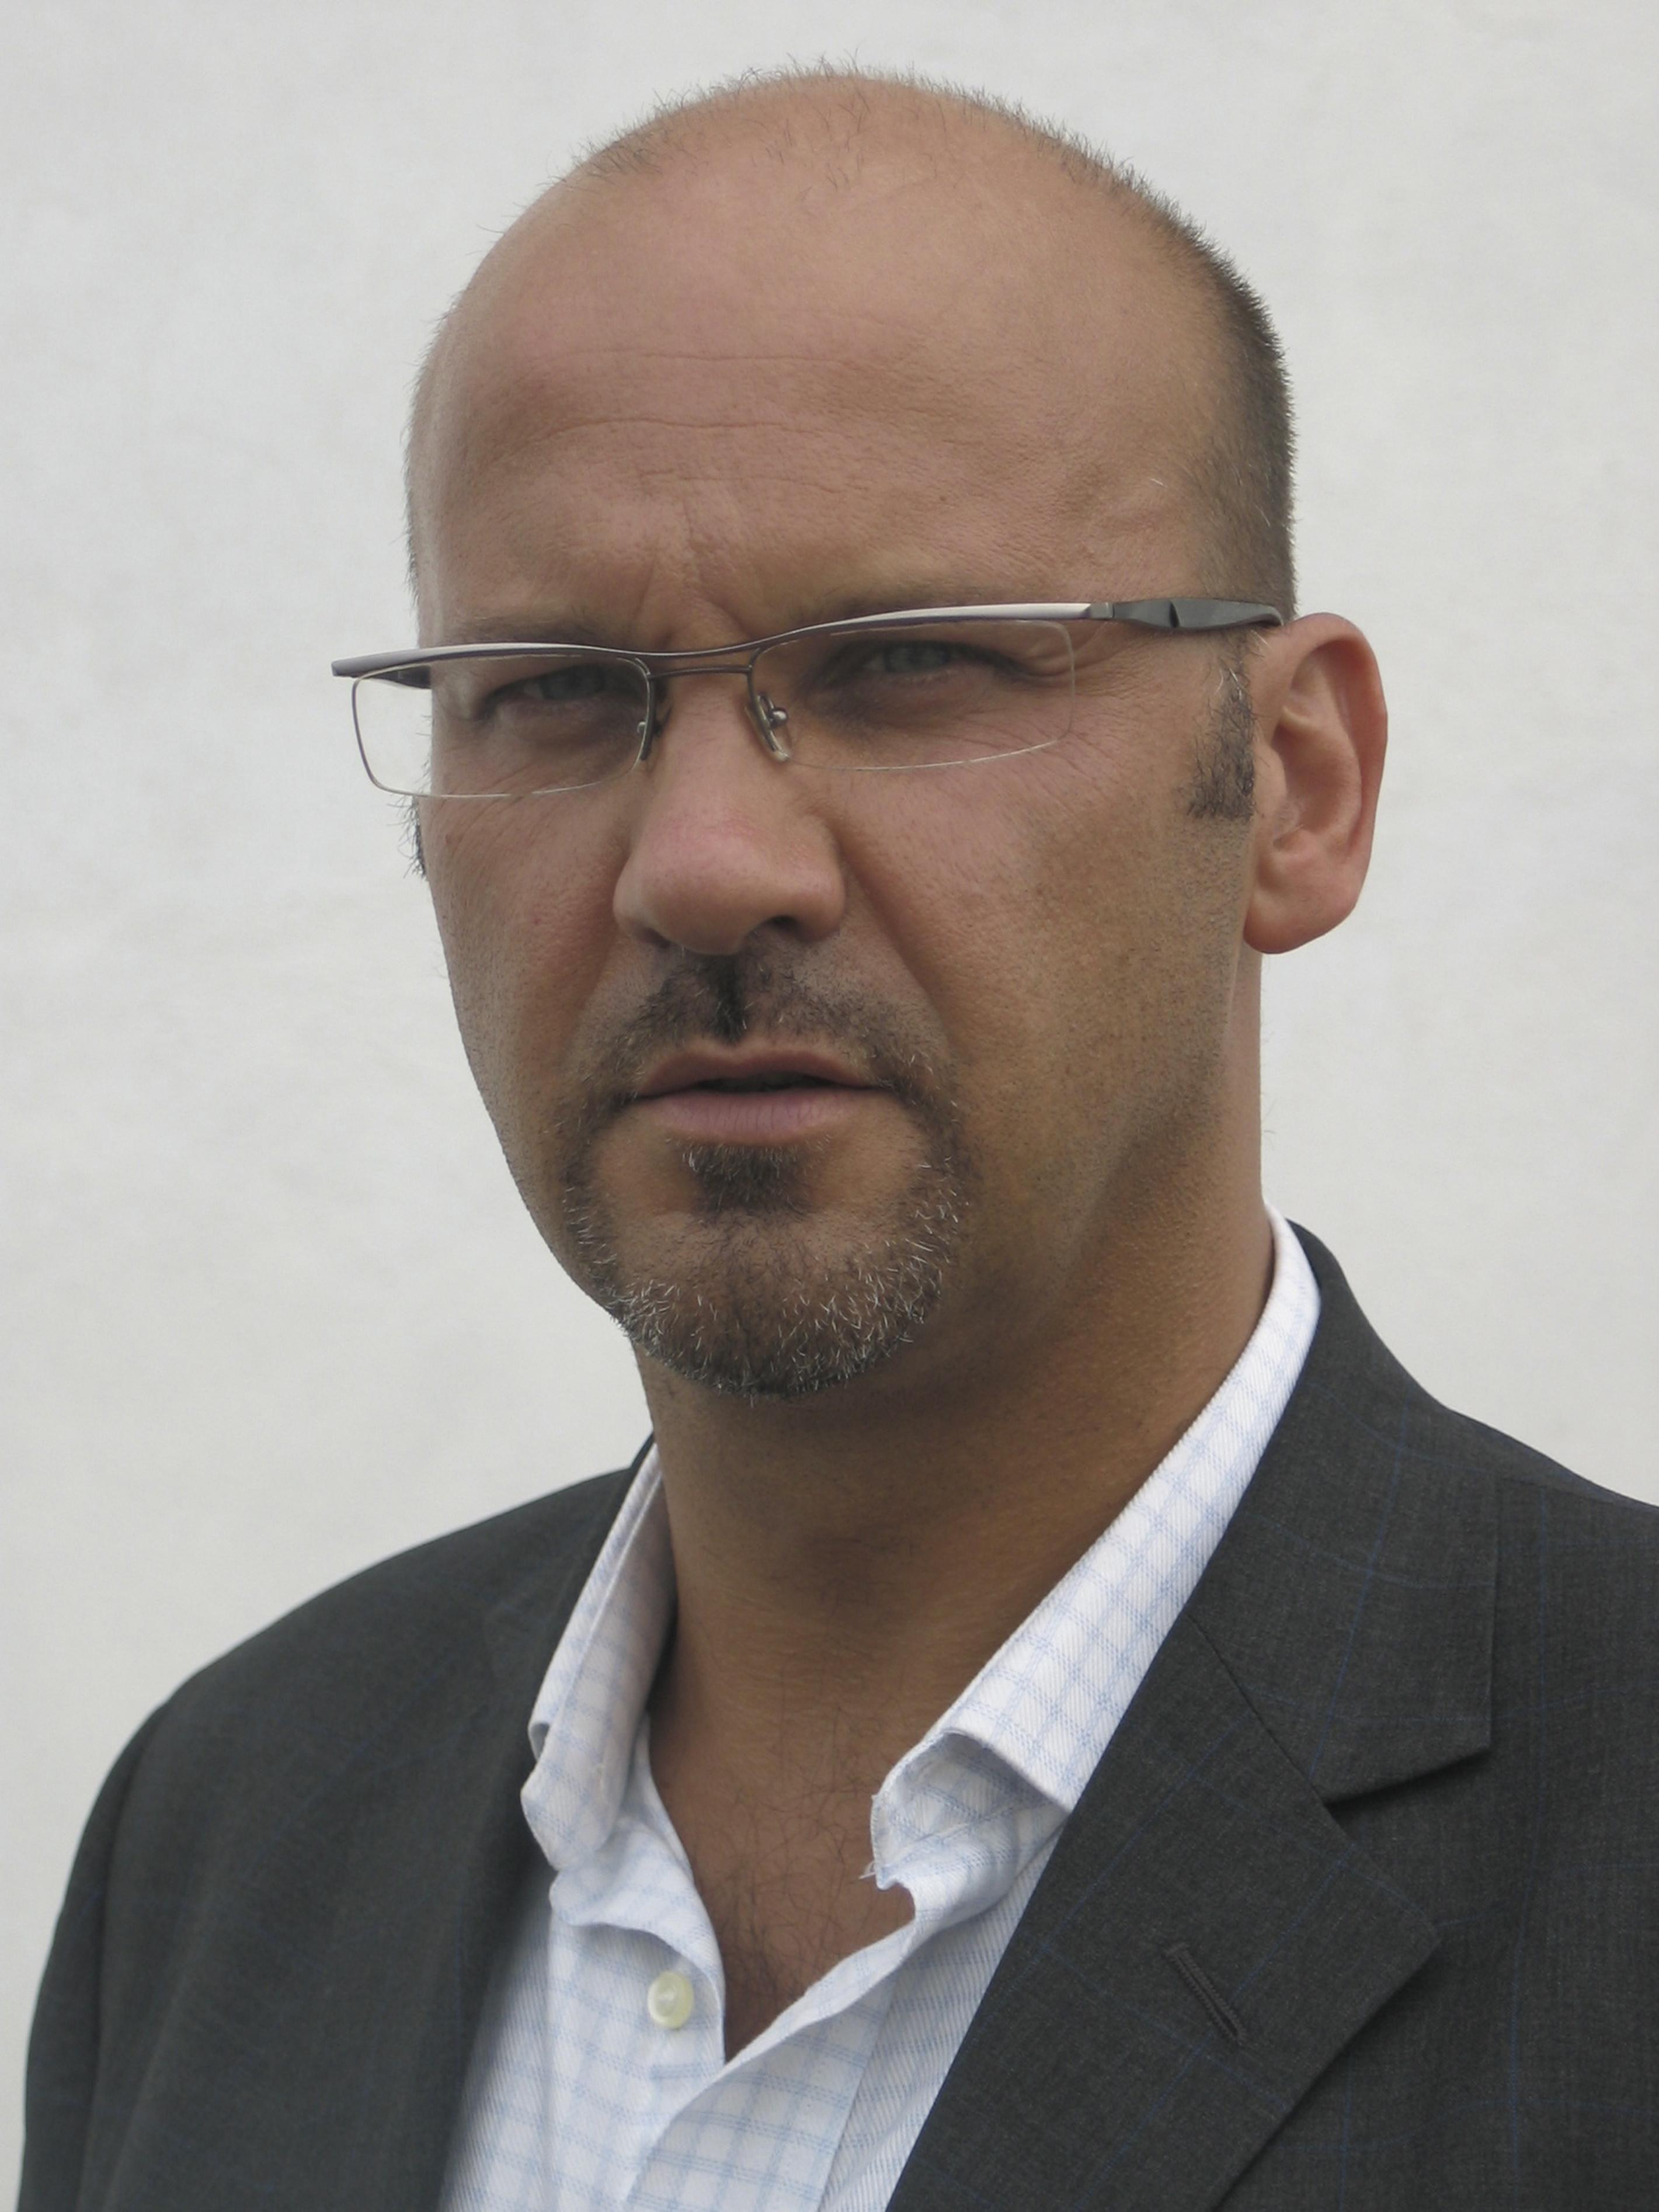 John Cammegh